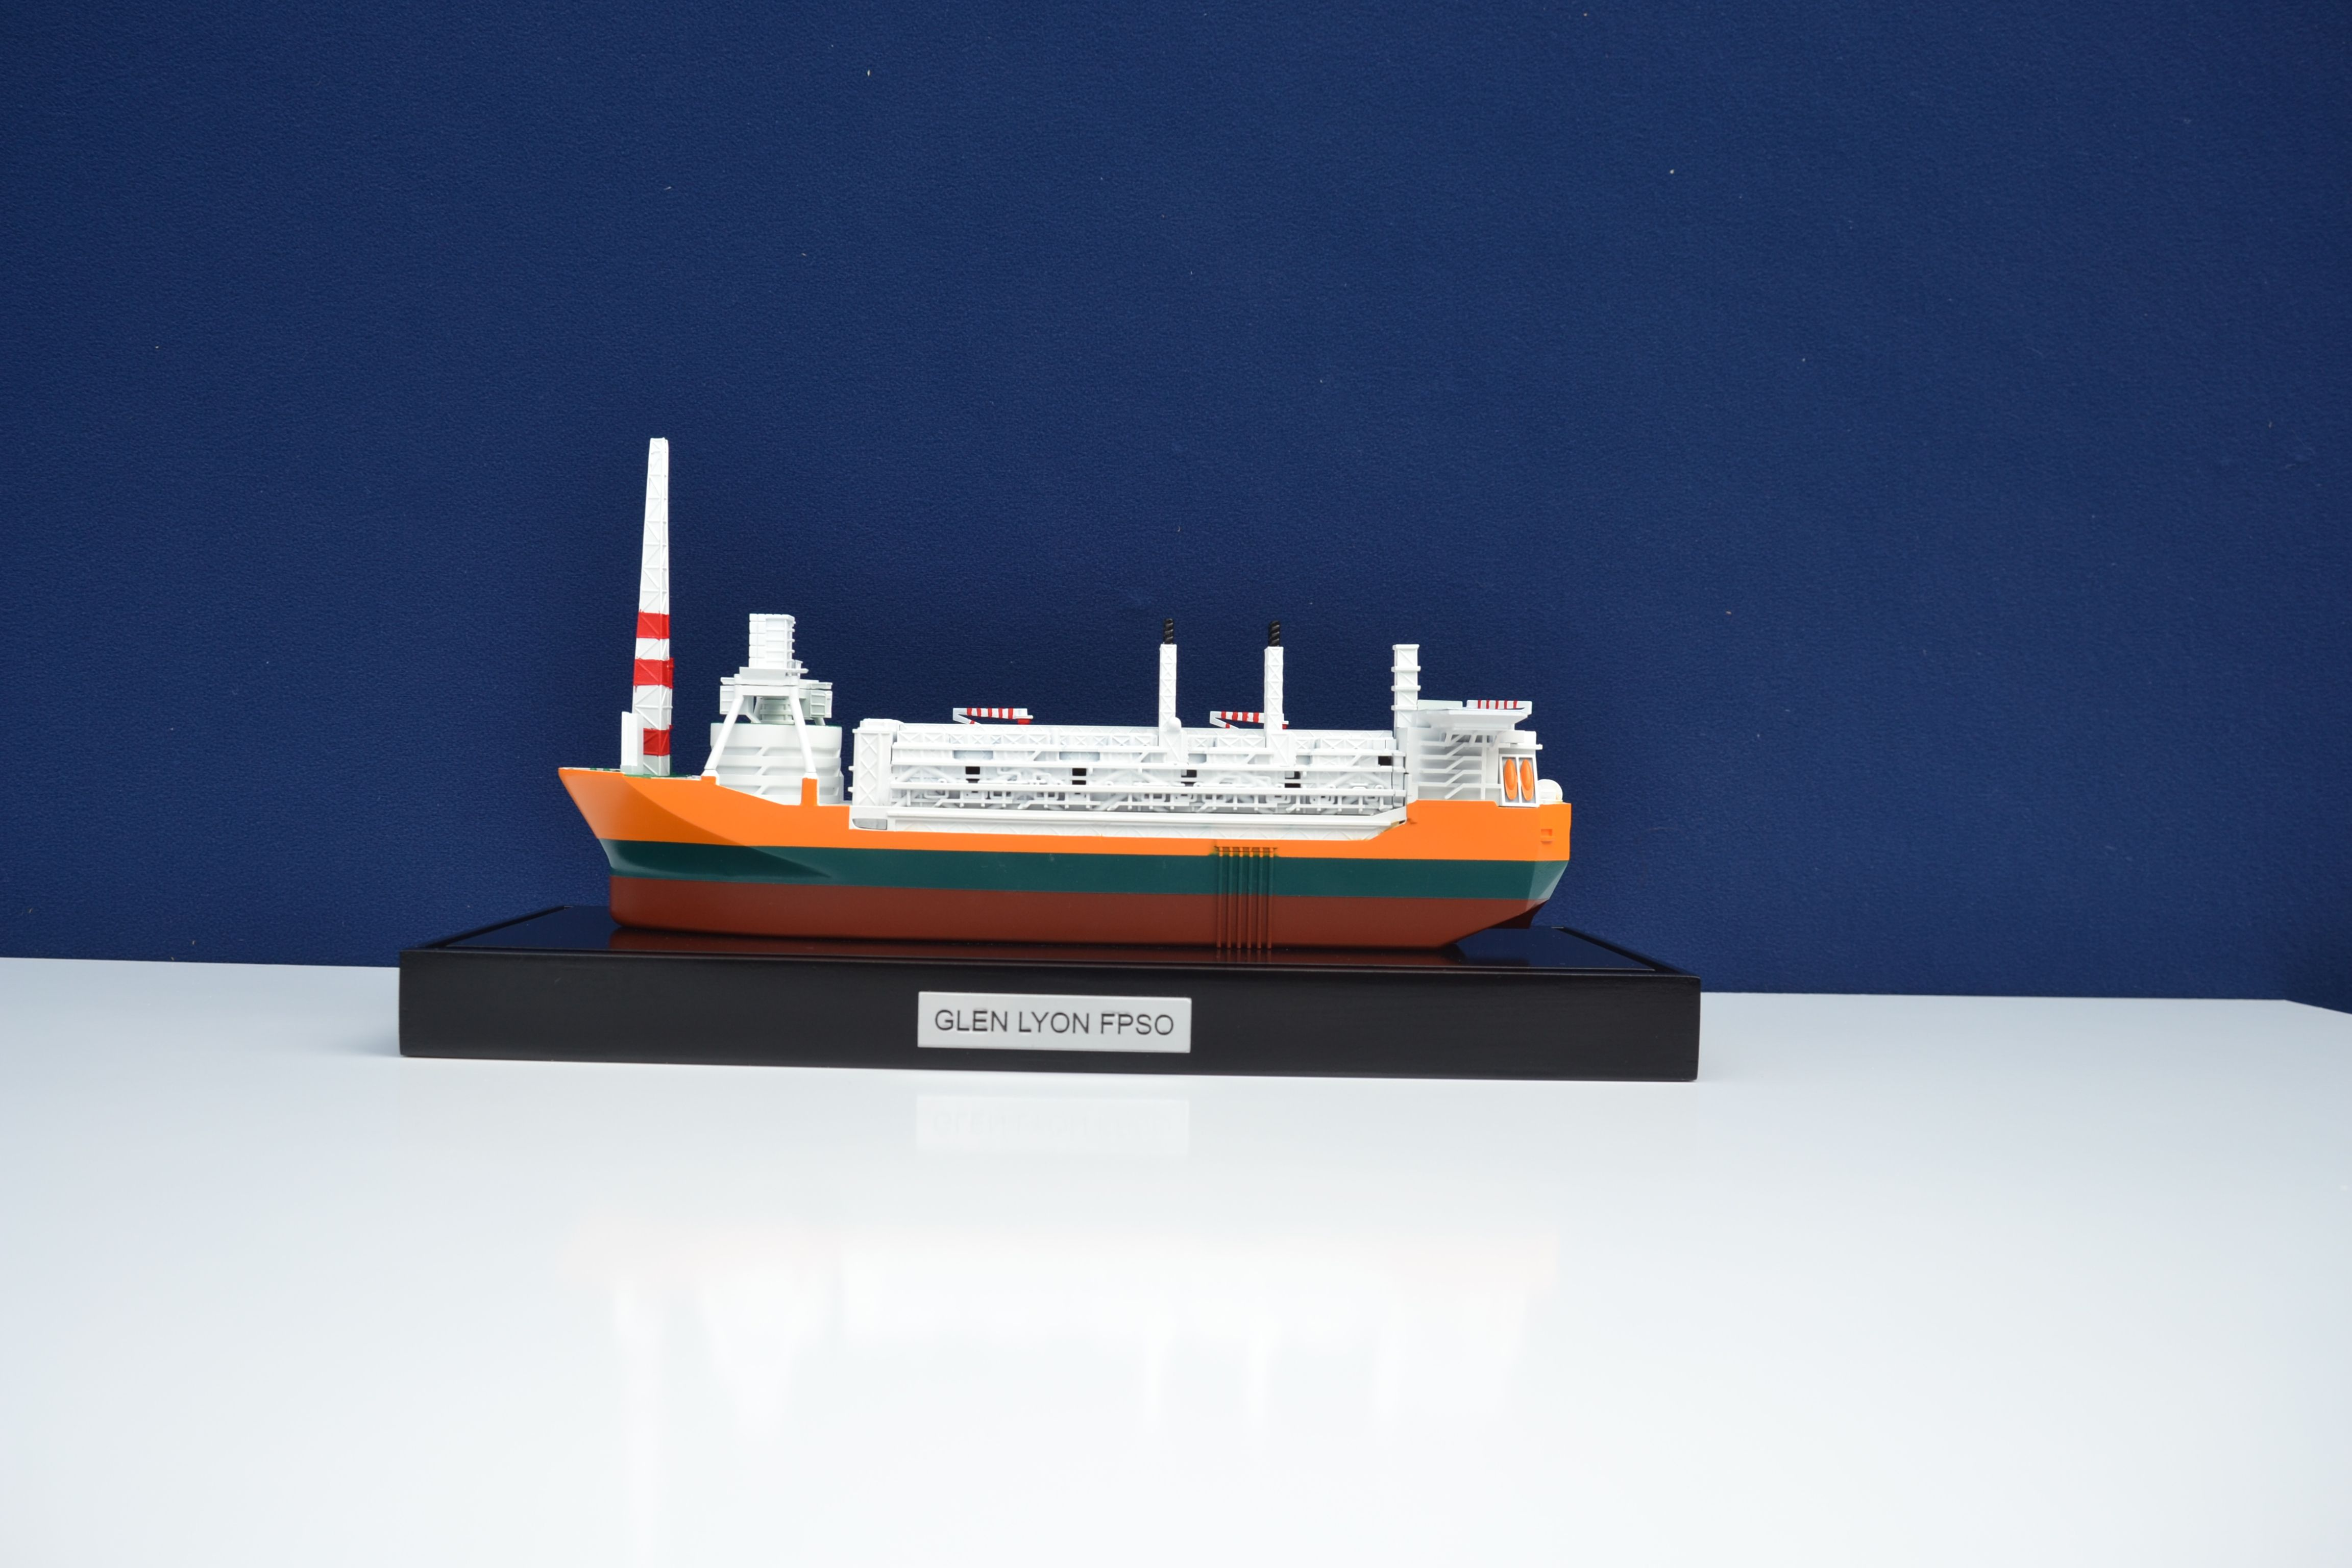 1857-11110-Glen-Lyon-FPSO-Mini-Modele